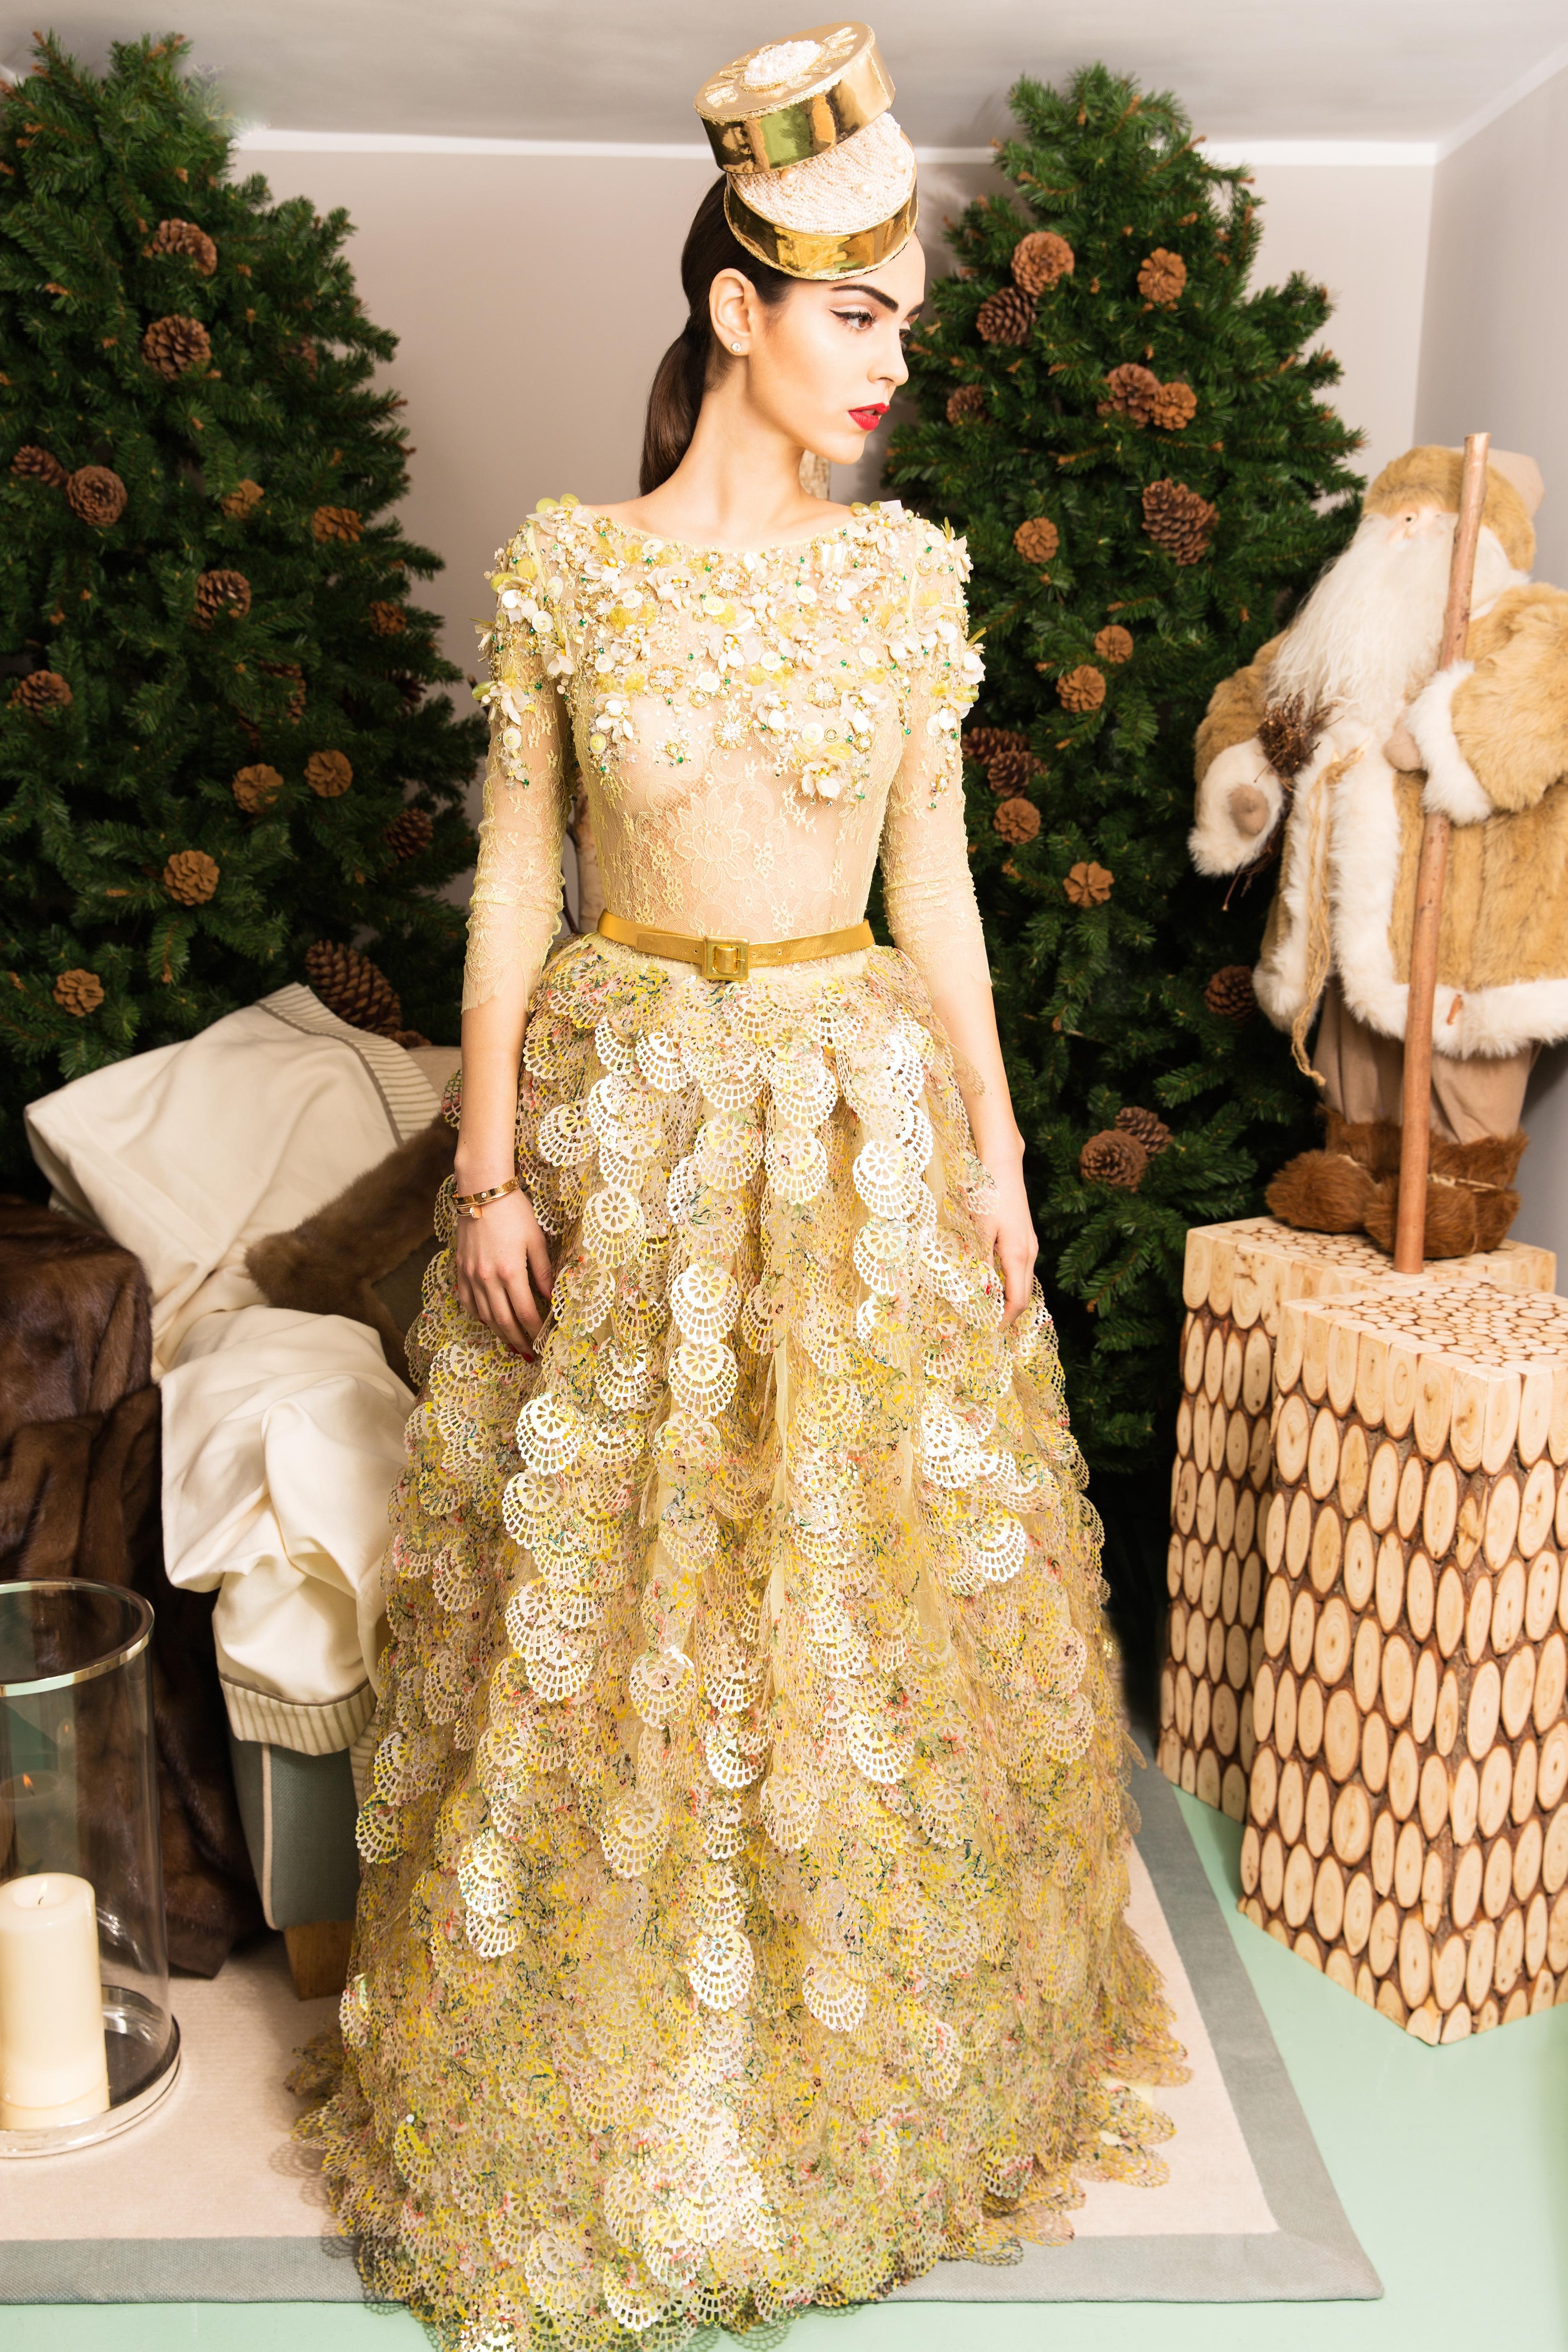 Julia gold dressFINAL